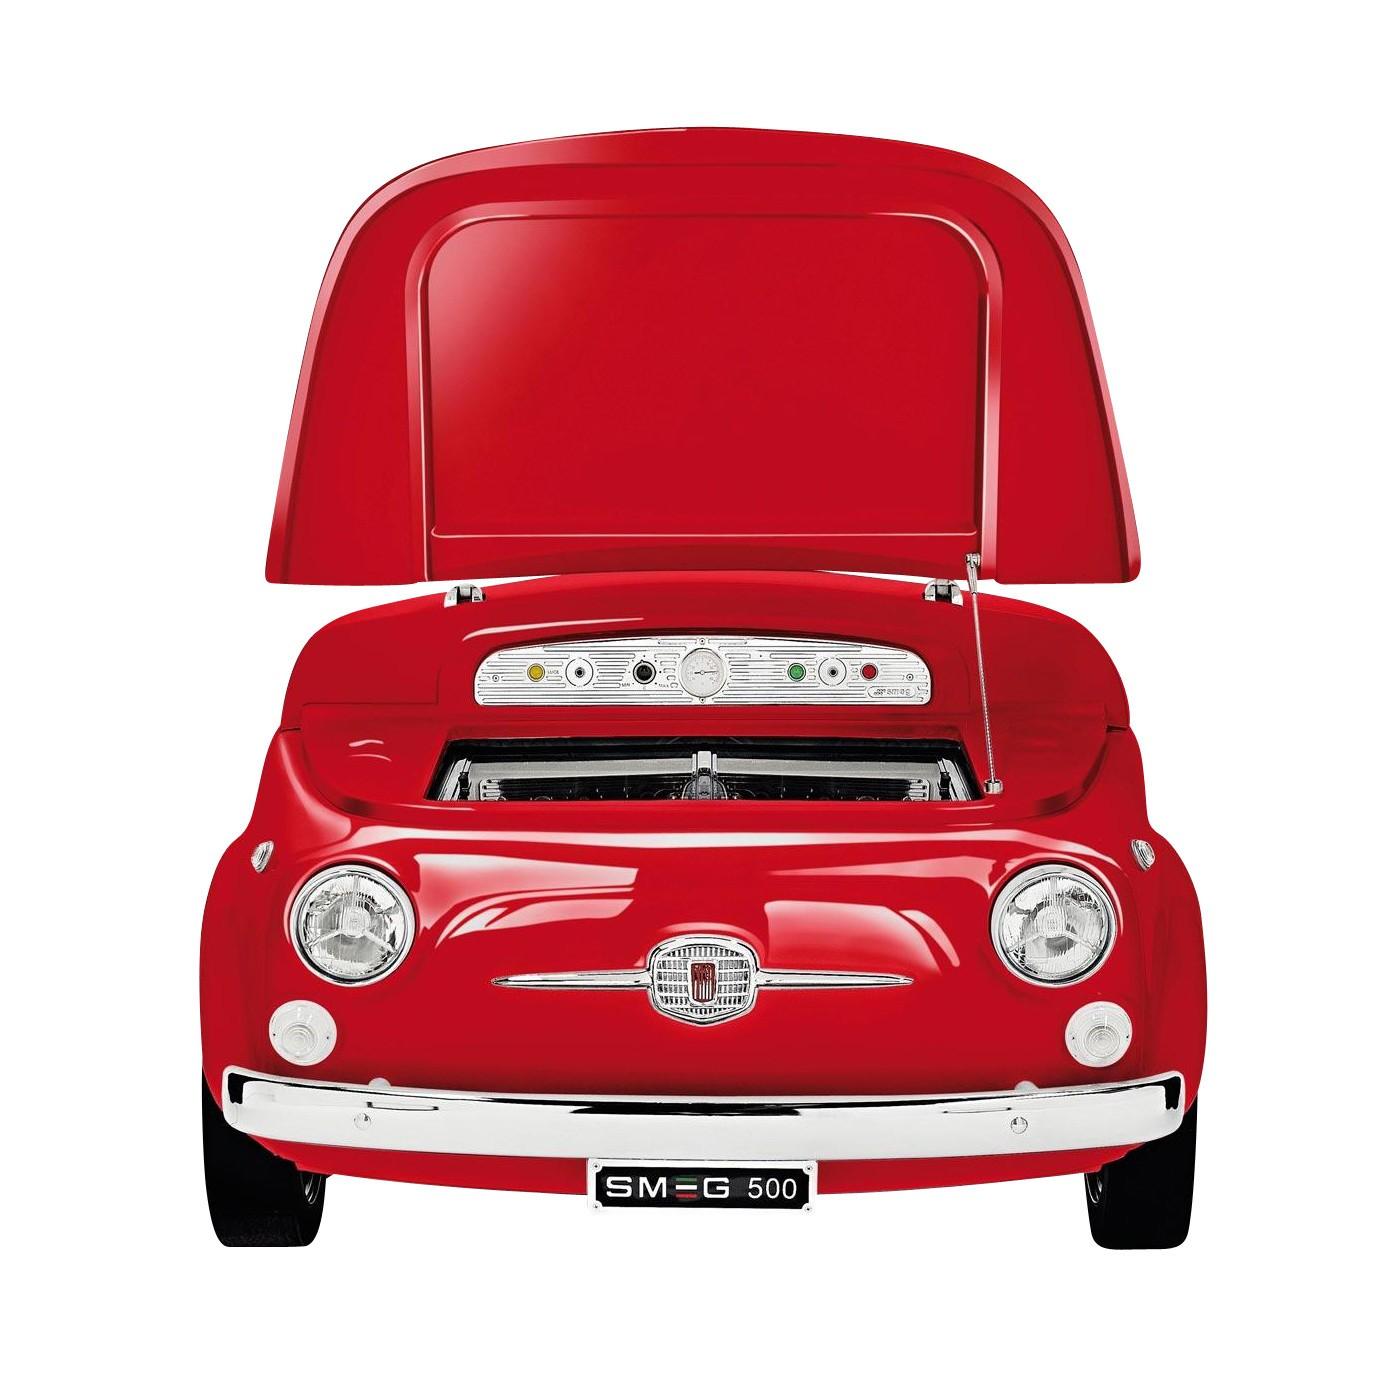 Smeg Fiat 500 Minibar Kühltruhe Rot 125x80x83cm Fiat500